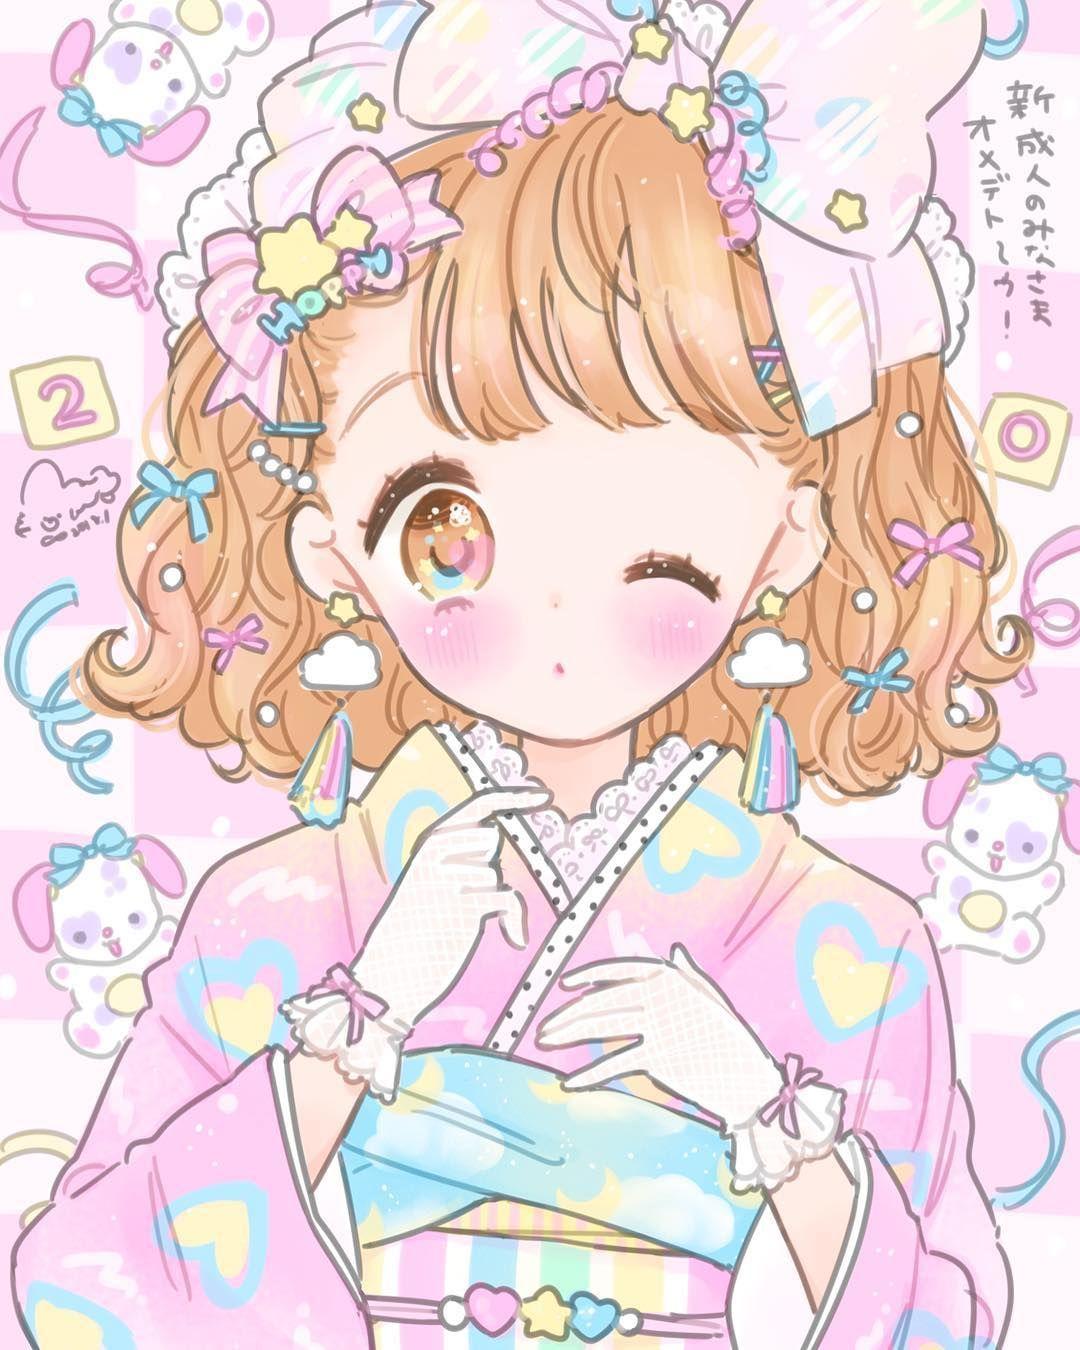 Cute Anime Wallpapers: Pin By ™�Barbie Stargirl♡ On KaWaii♡ In 2019